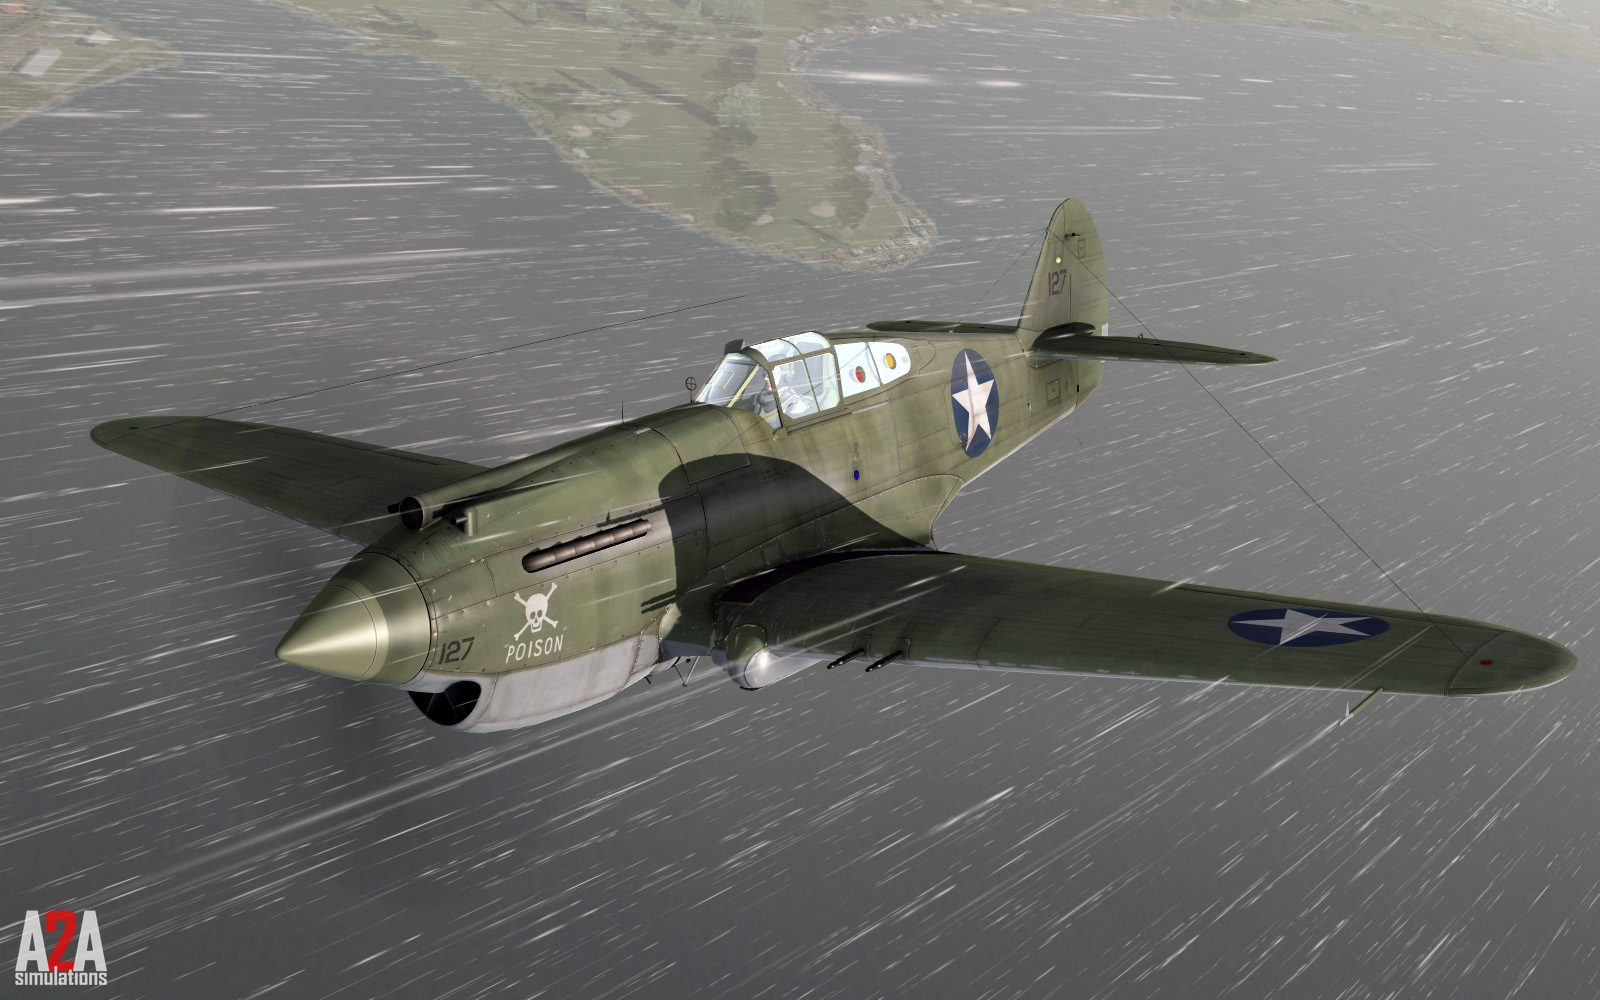 P-40_11-1600x1000.jpg